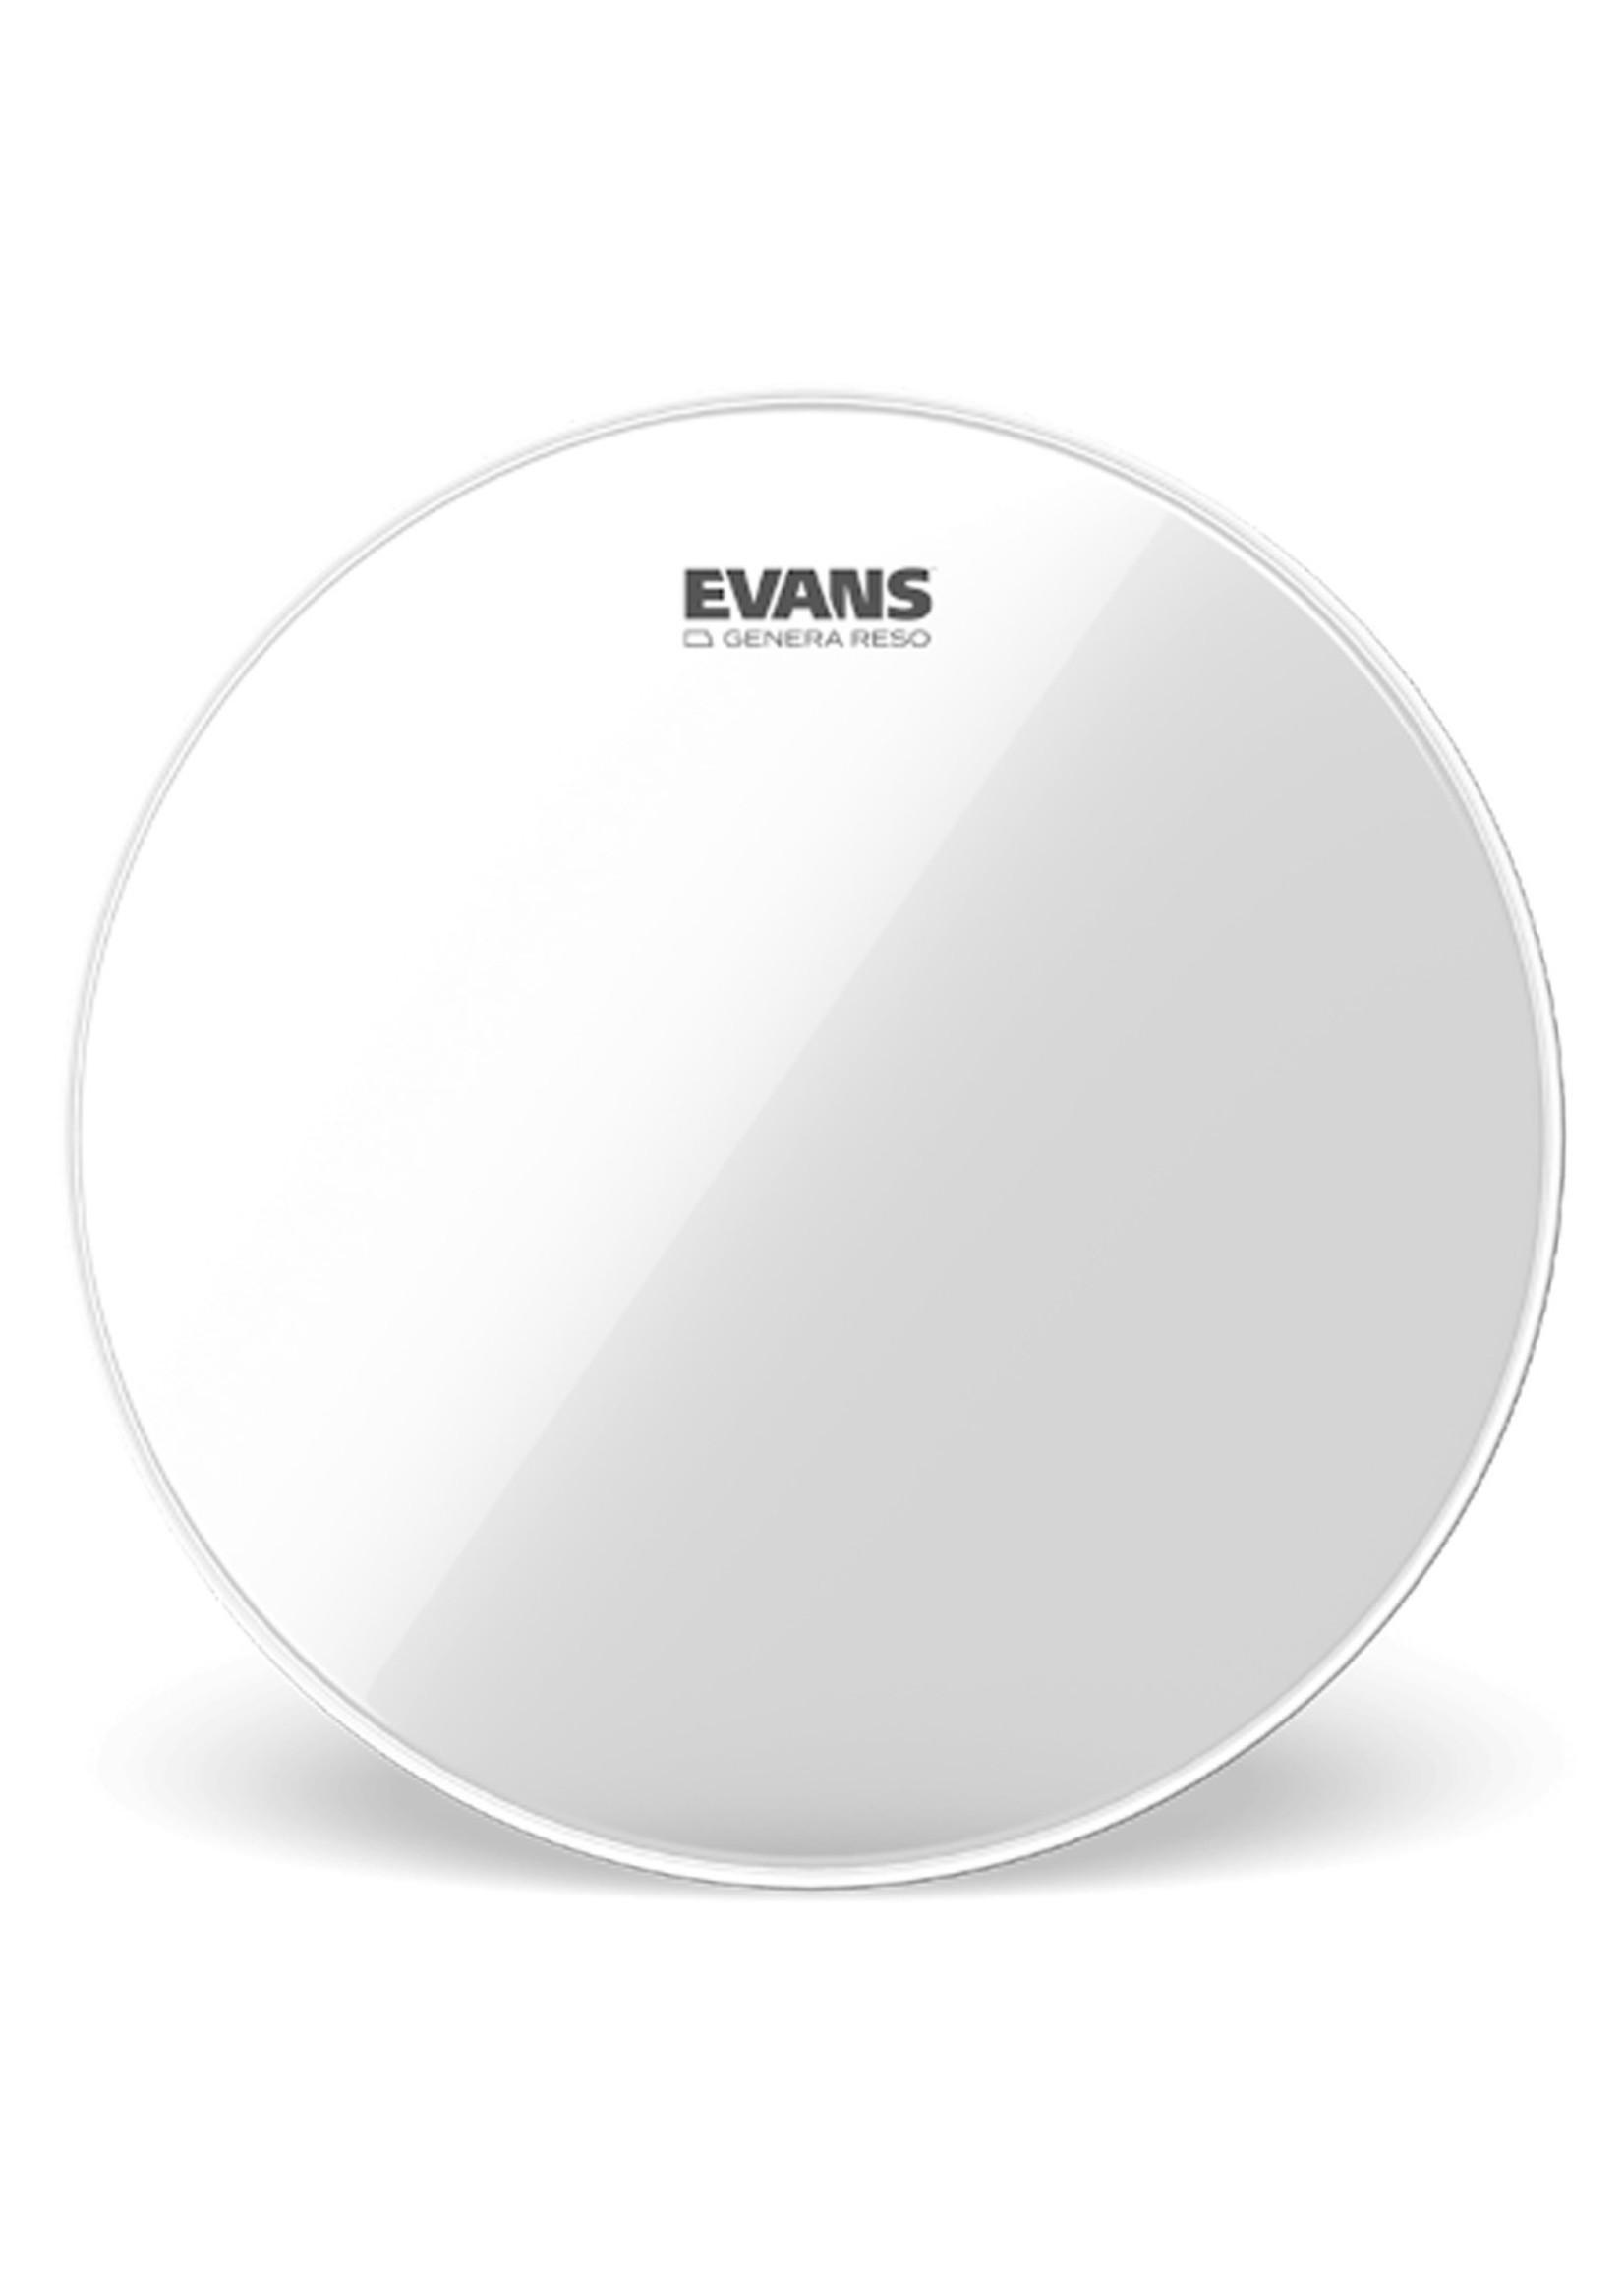 "Evans 16"" Generea Resonant"